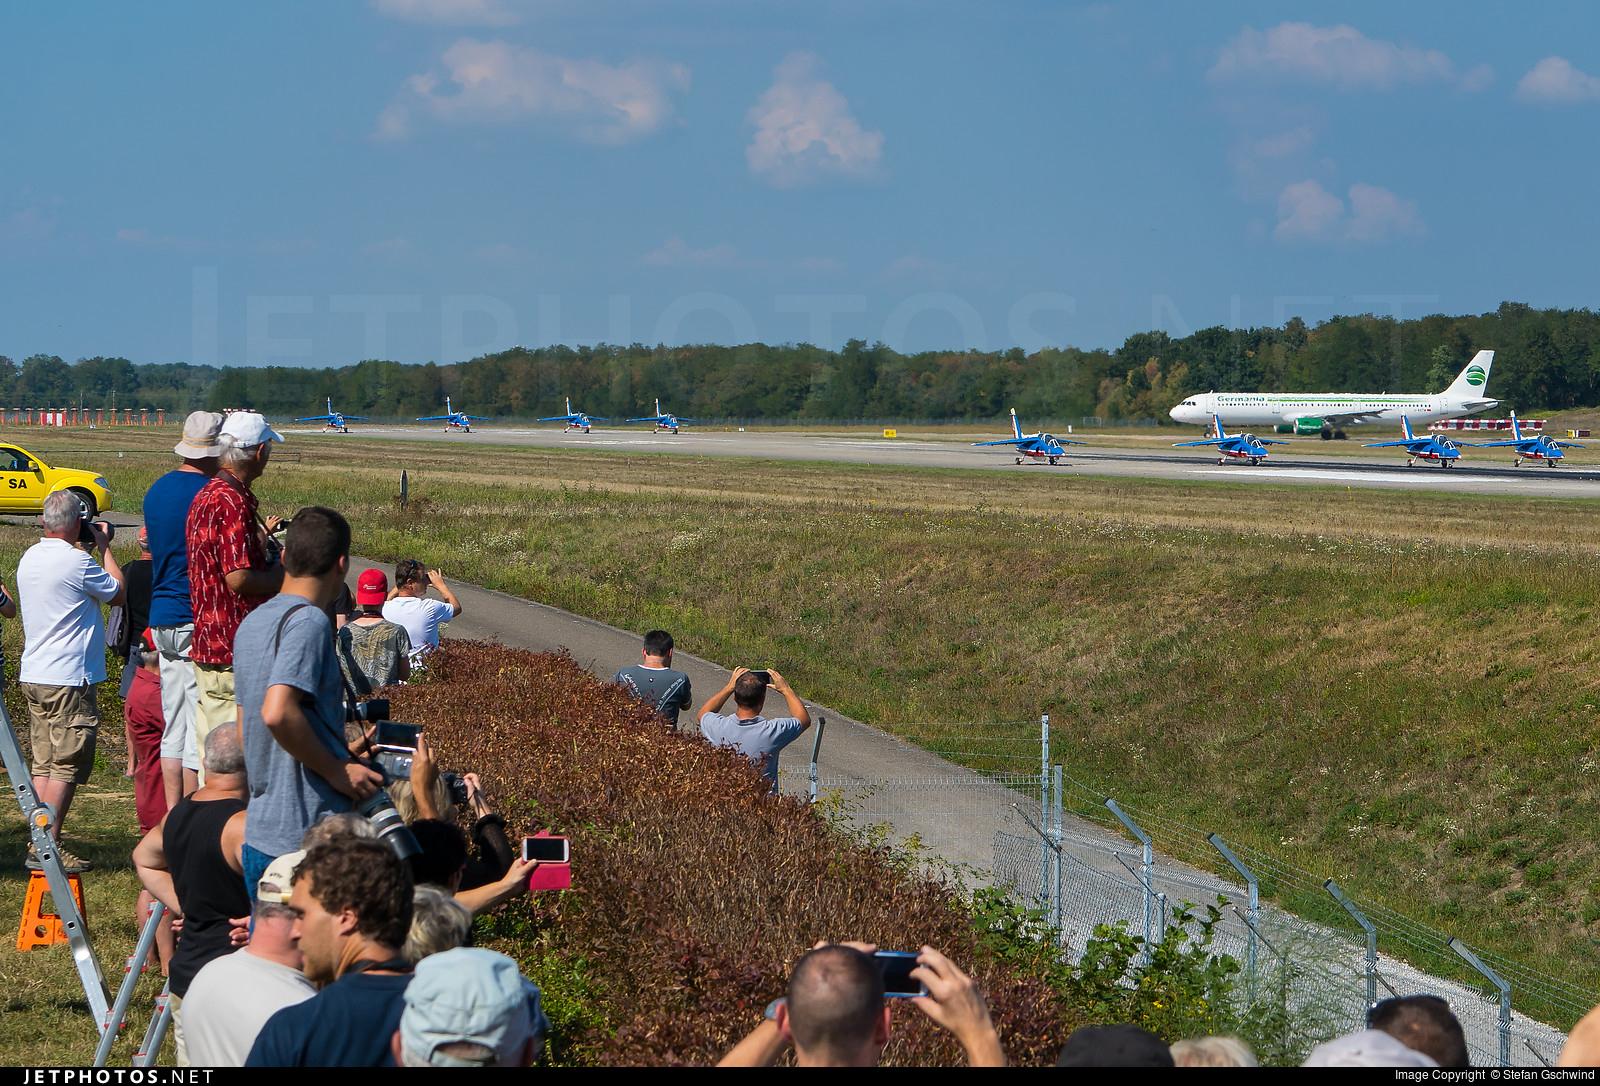 LFSB - Airport - Spotting Location